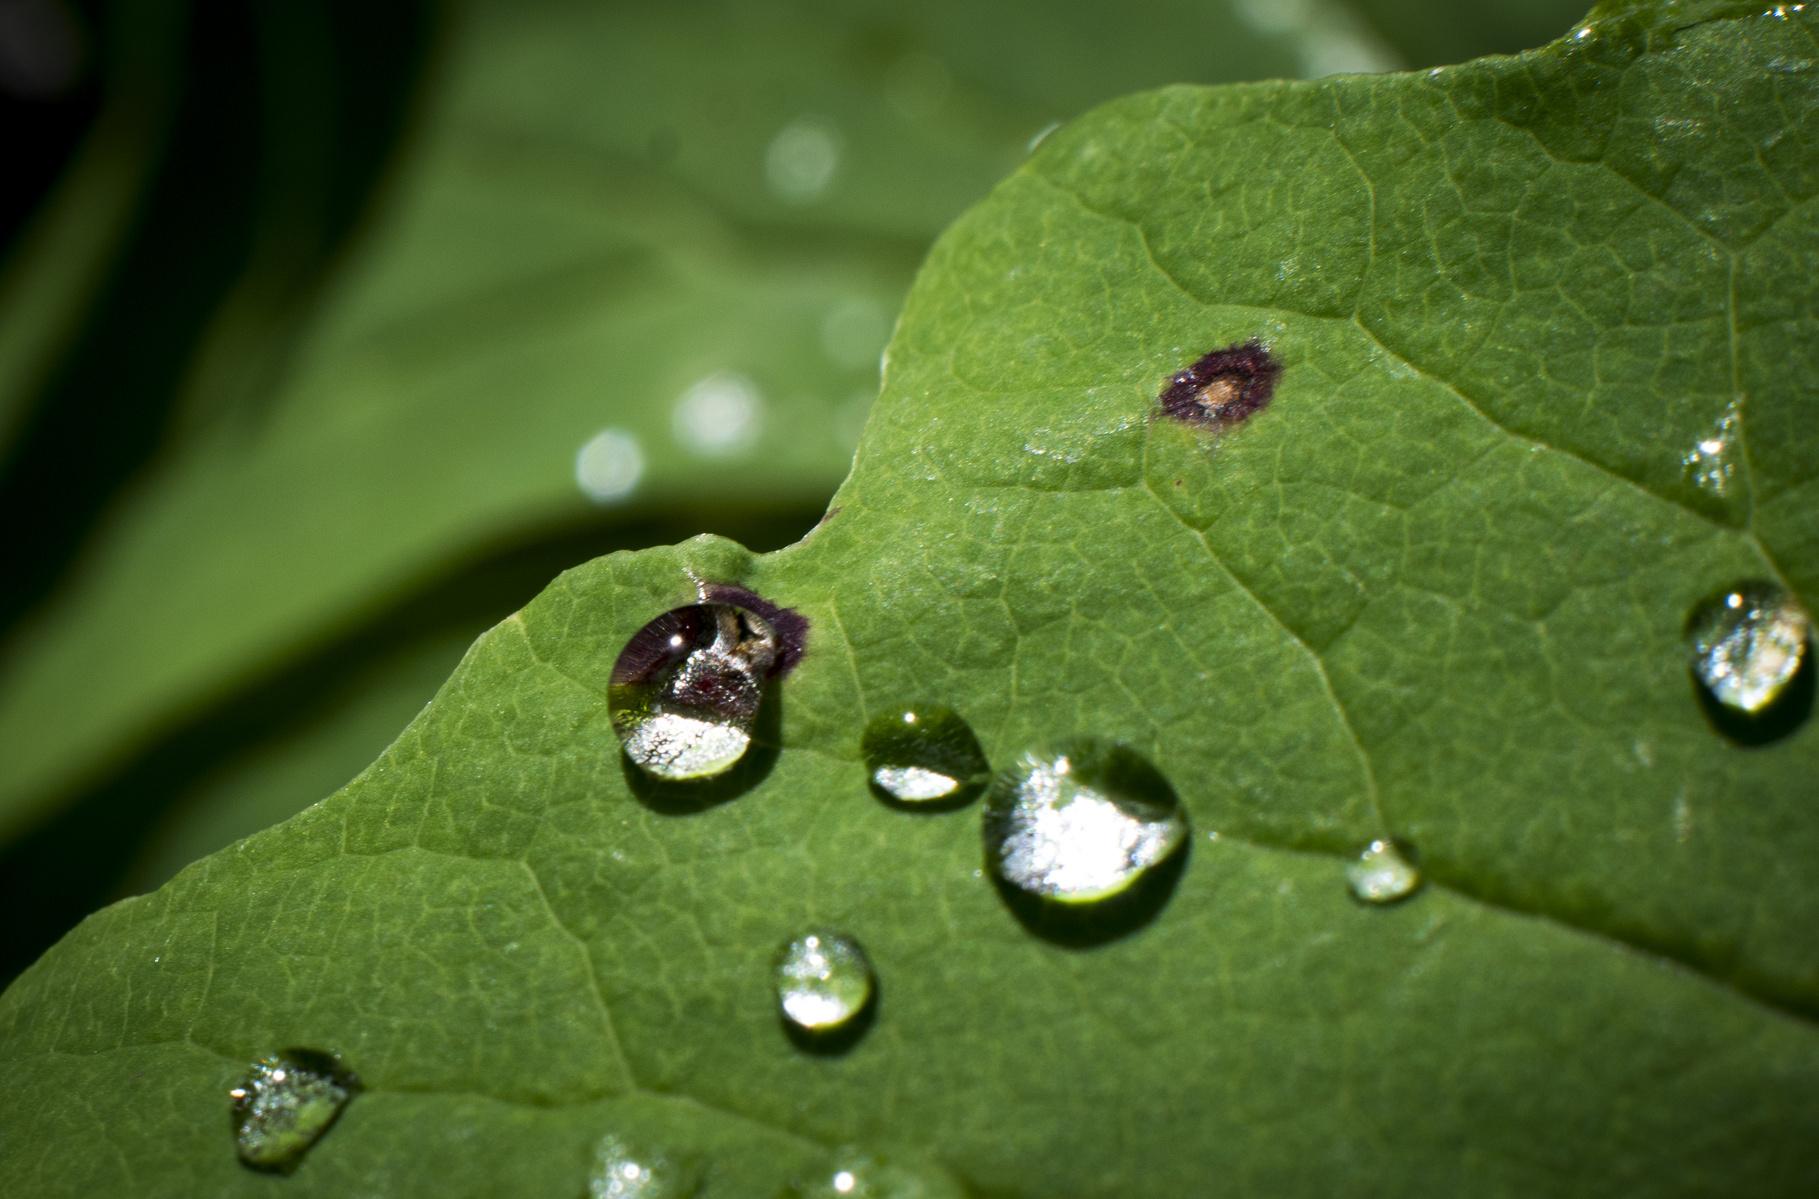 sprinkled on the leaves